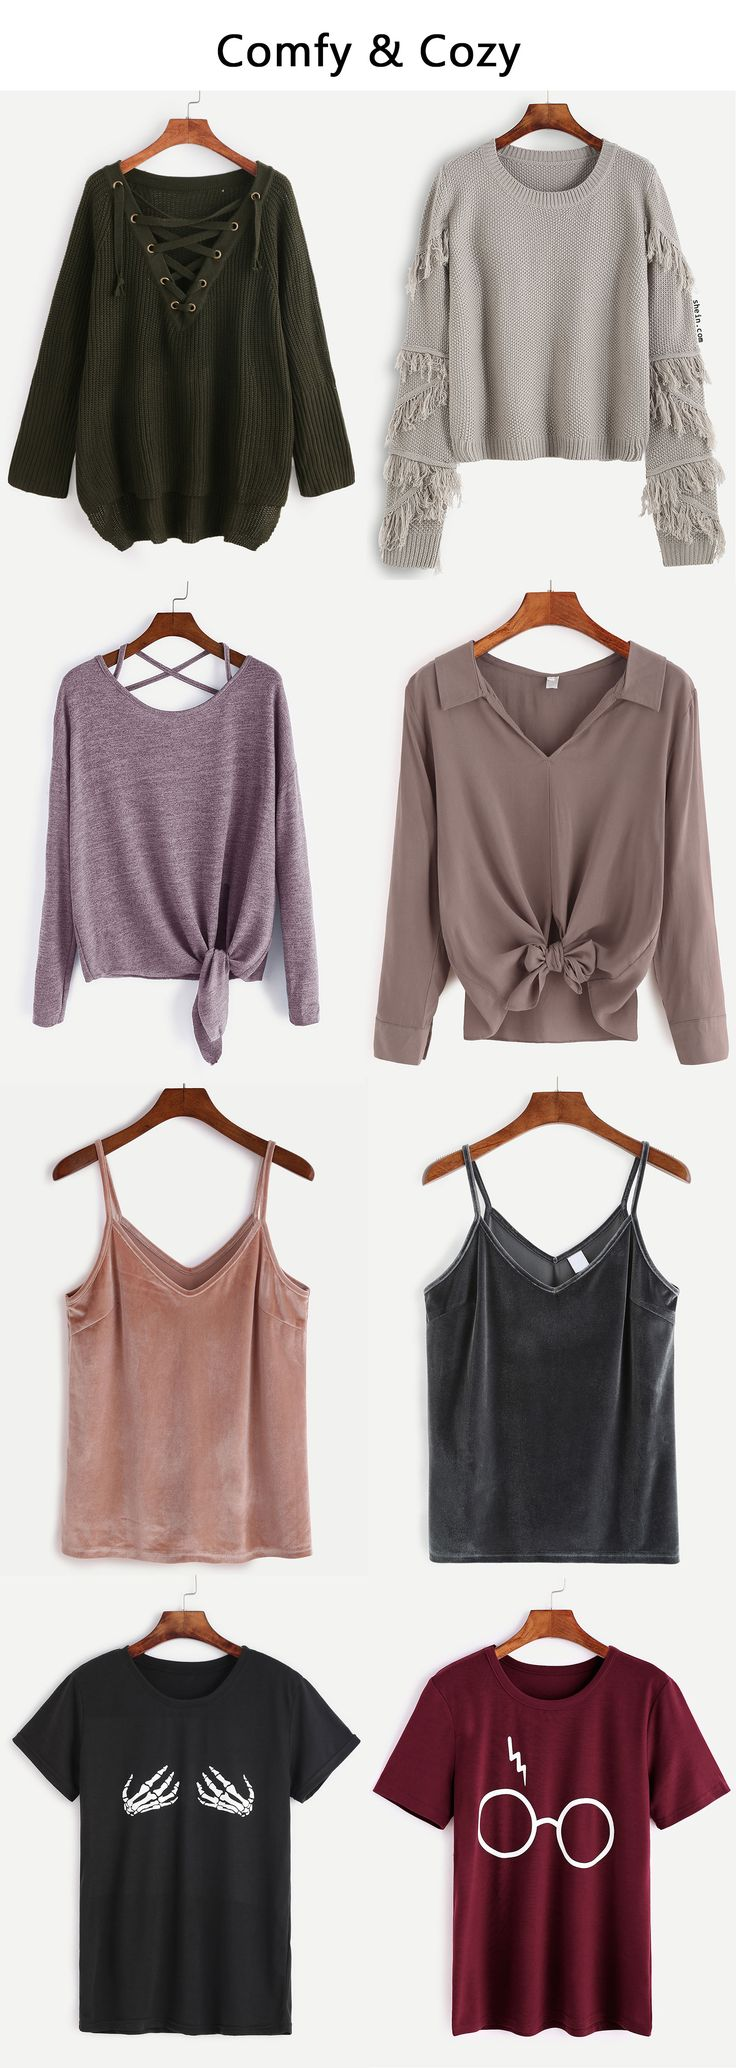 Comfy & cozy tops. Shop now!